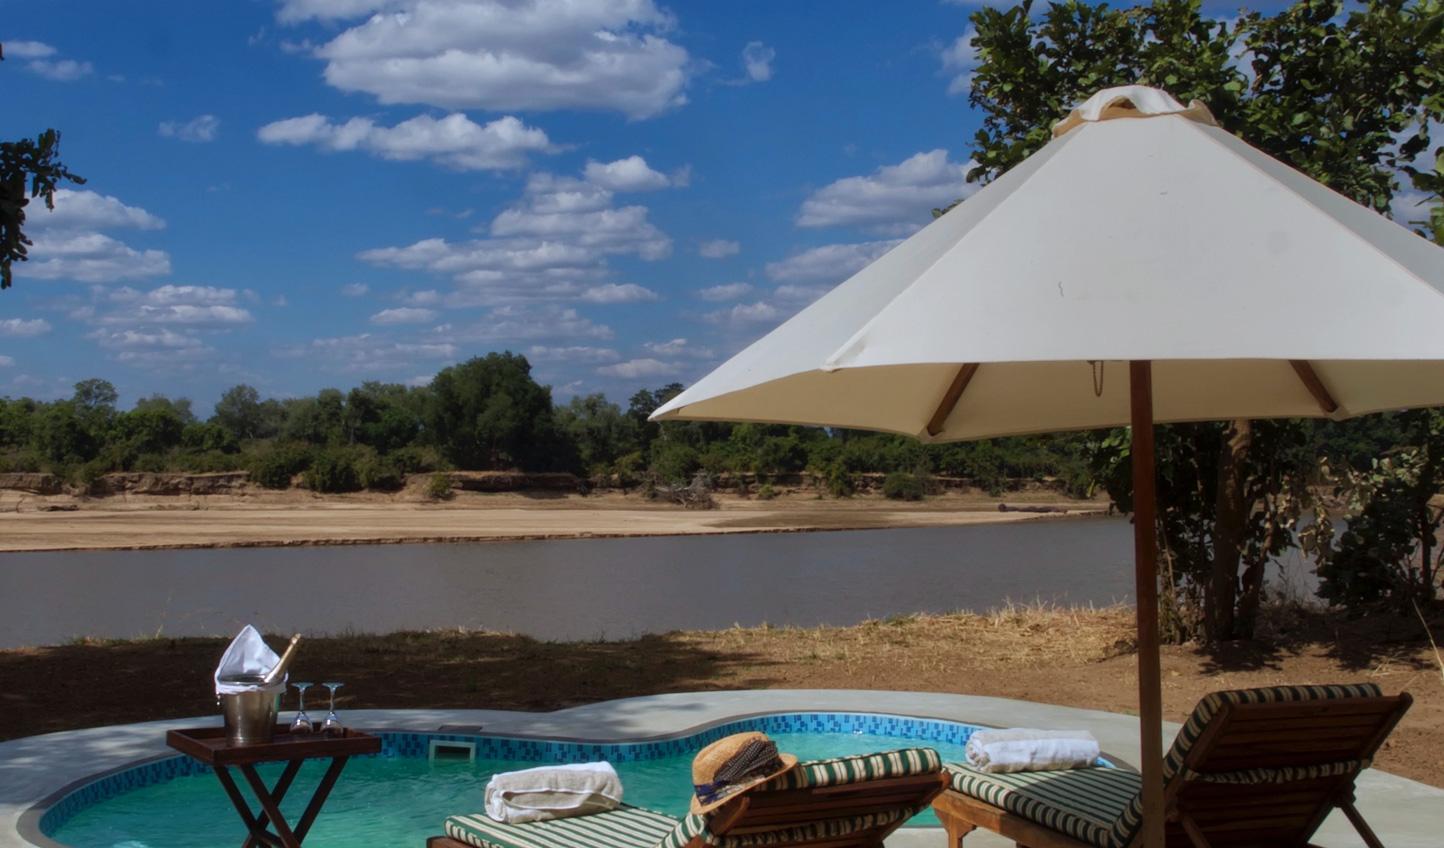 Sunbathe by the pool under the hot Zambian sun